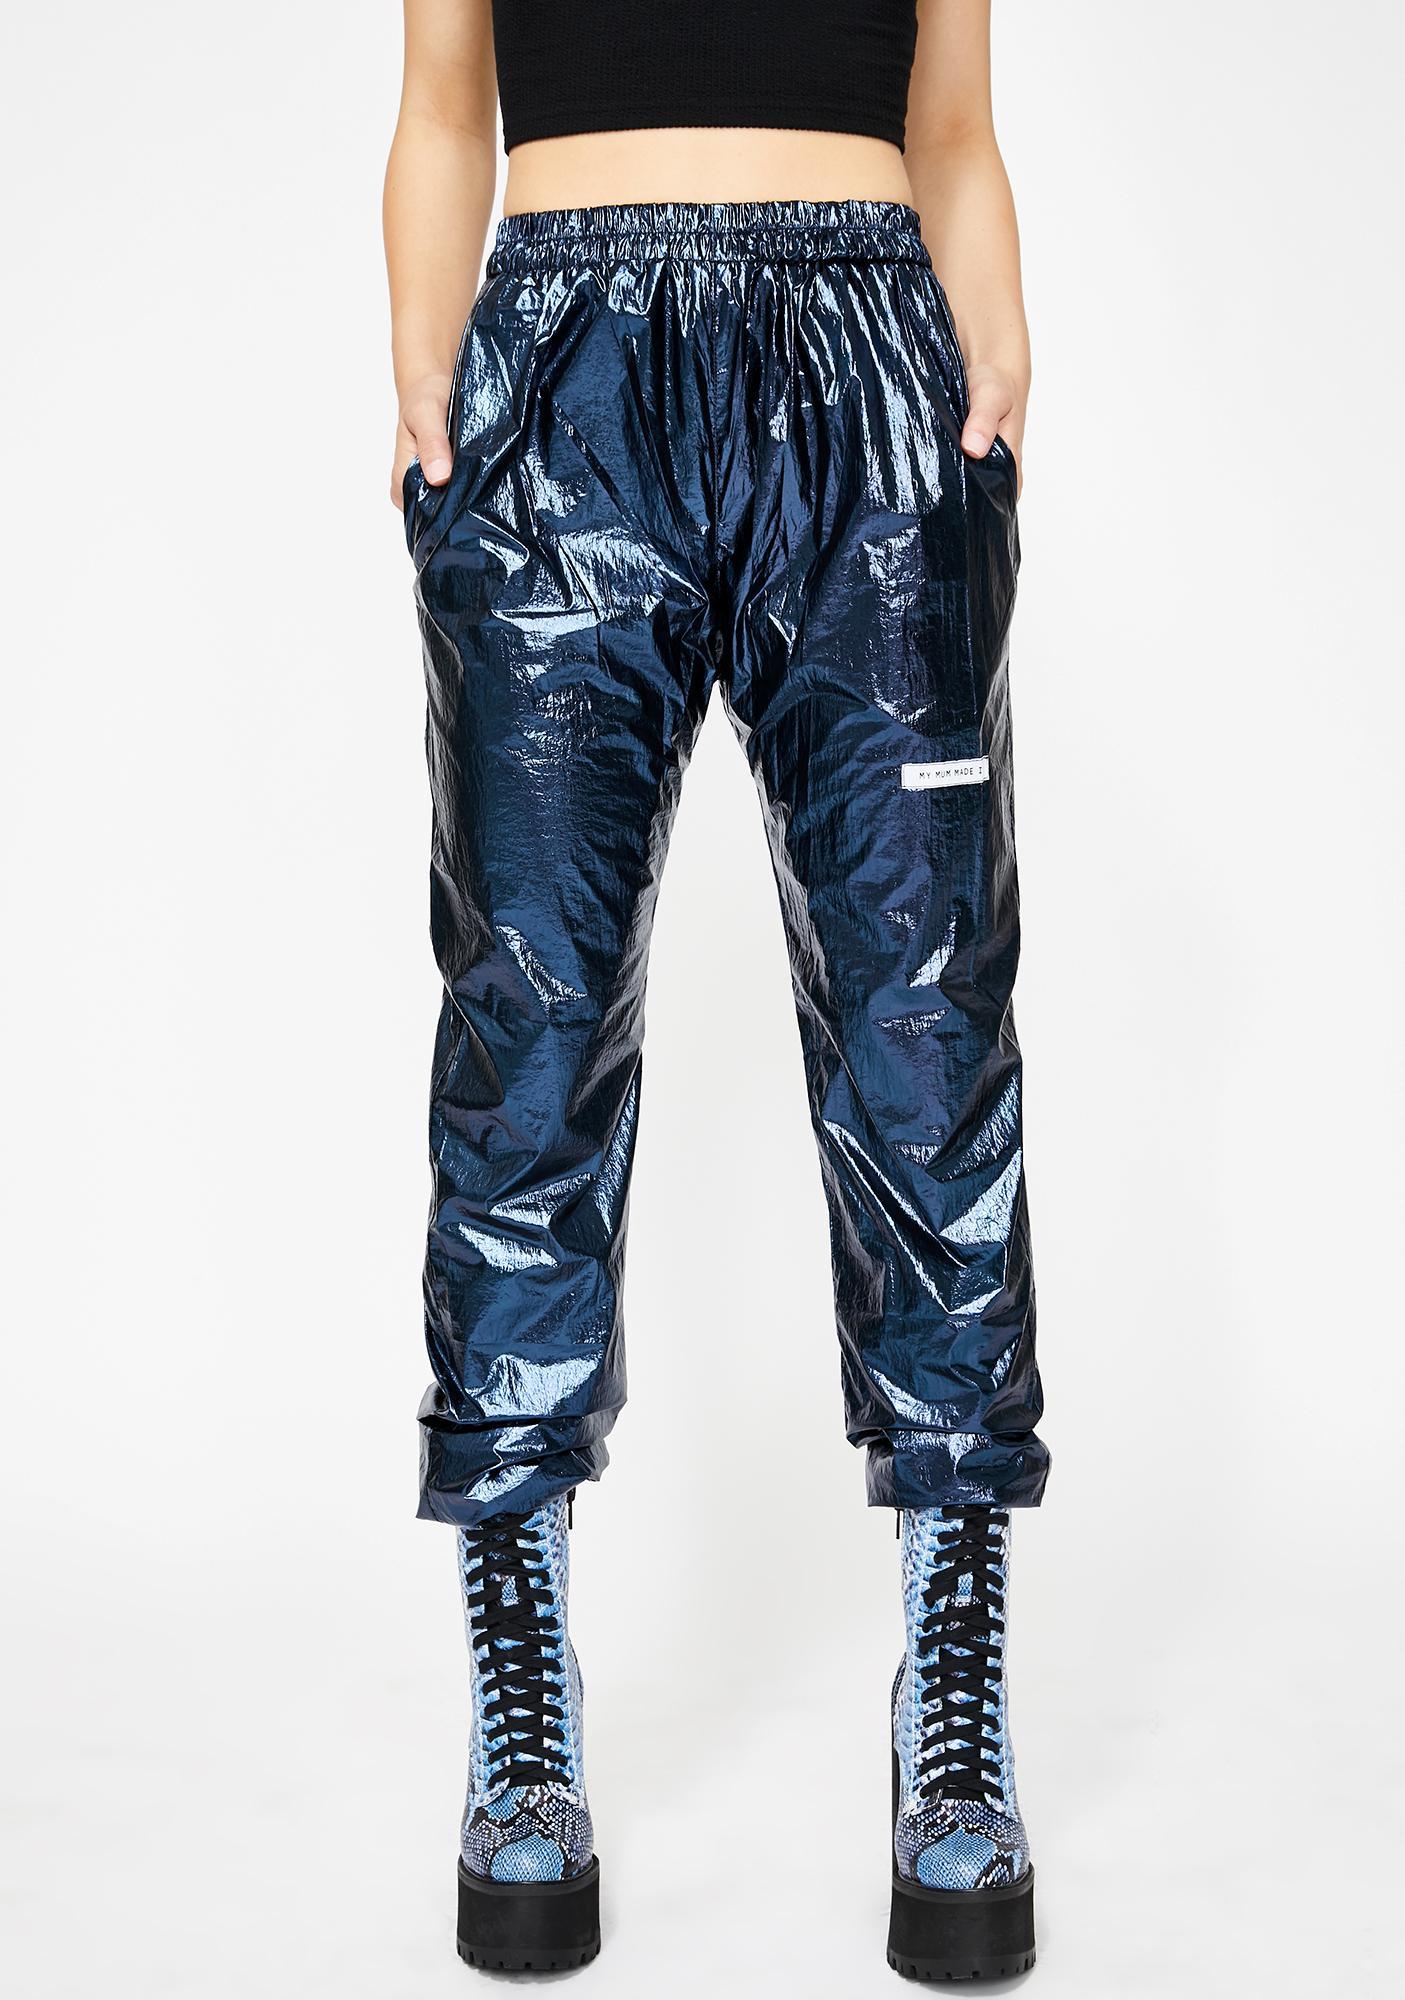 My Mum Made It Metallic Sweatpants